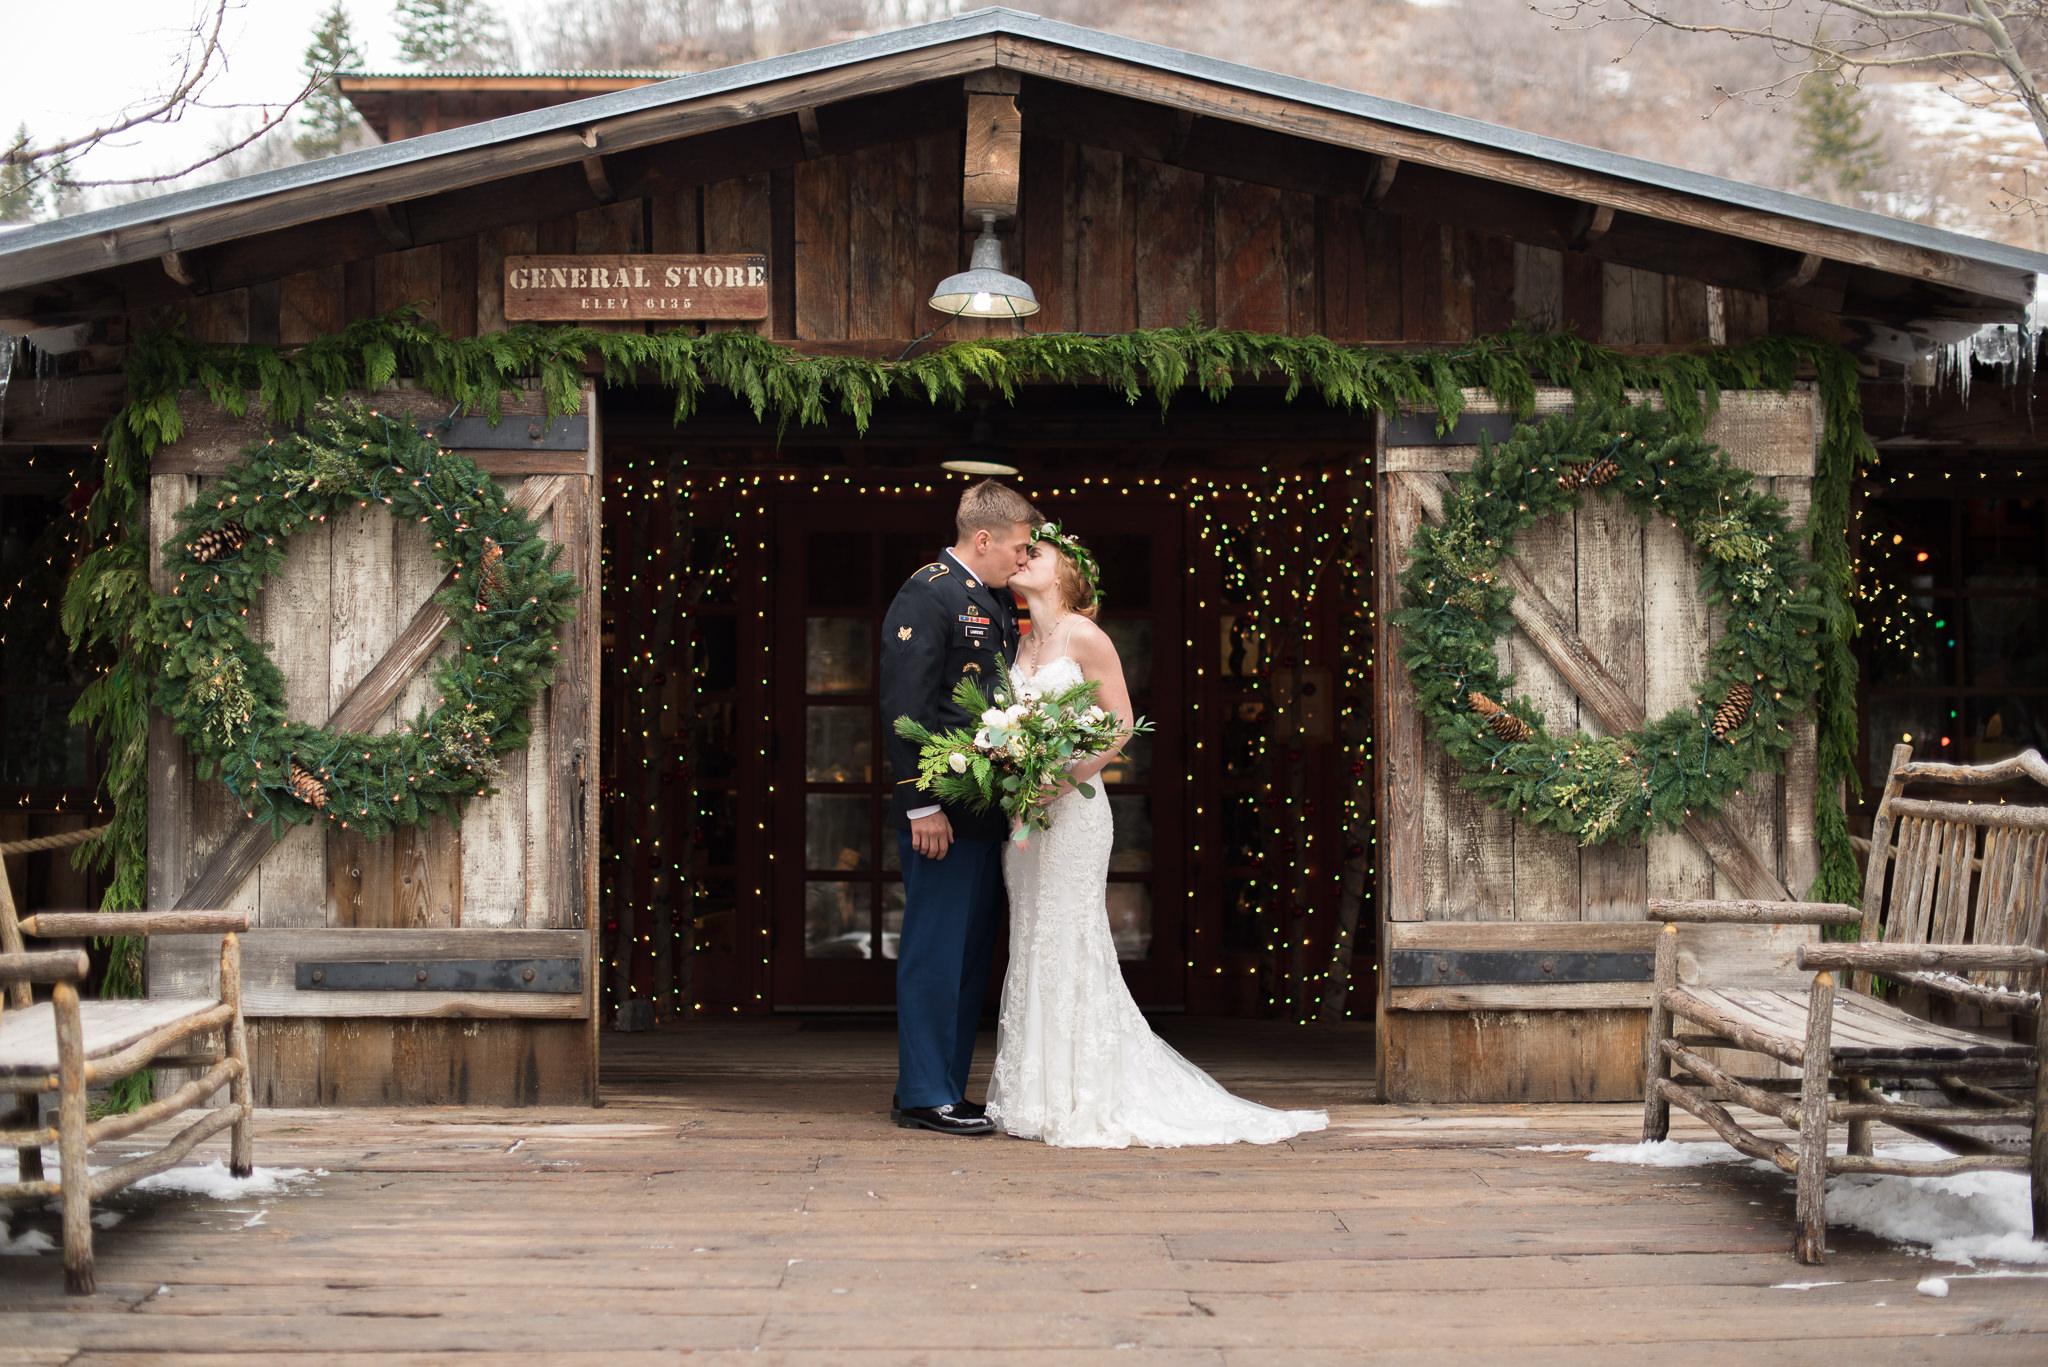 Trevor-Hooper-Wedding-Photographer-The-Bungalow-Wedding-Utah_CLR_019.jpg